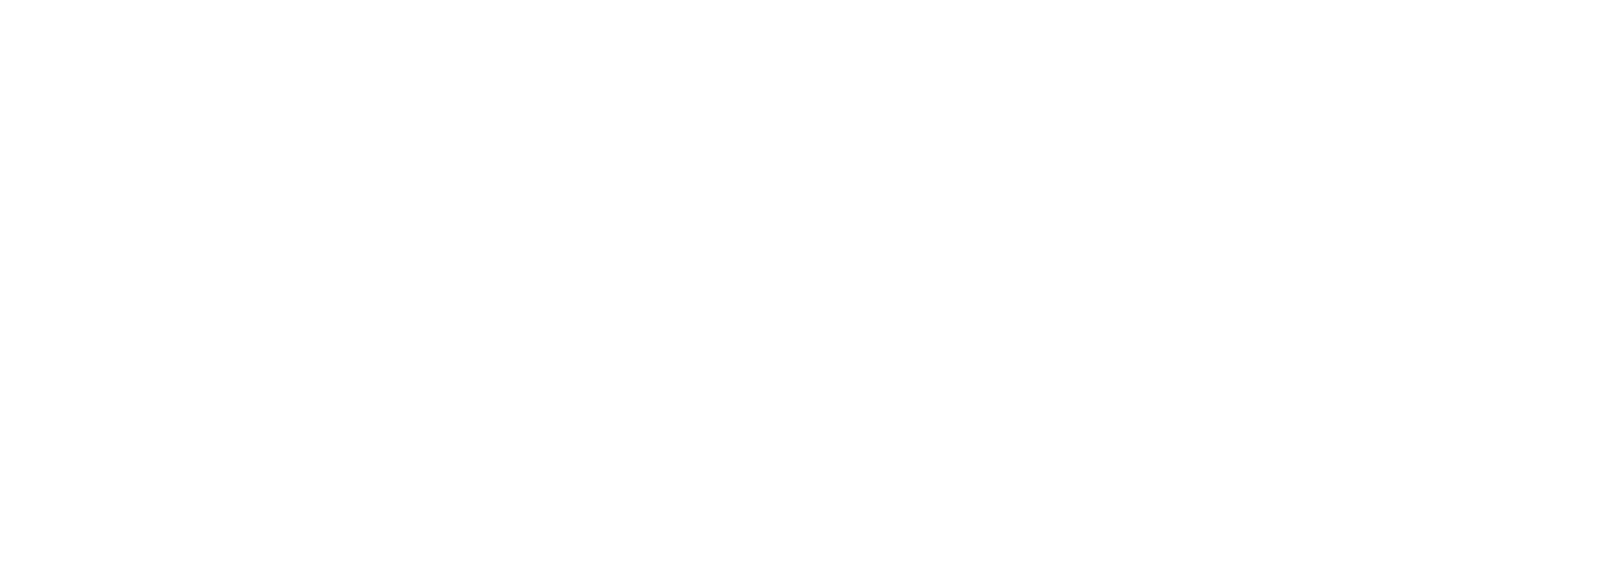 Tetex logo